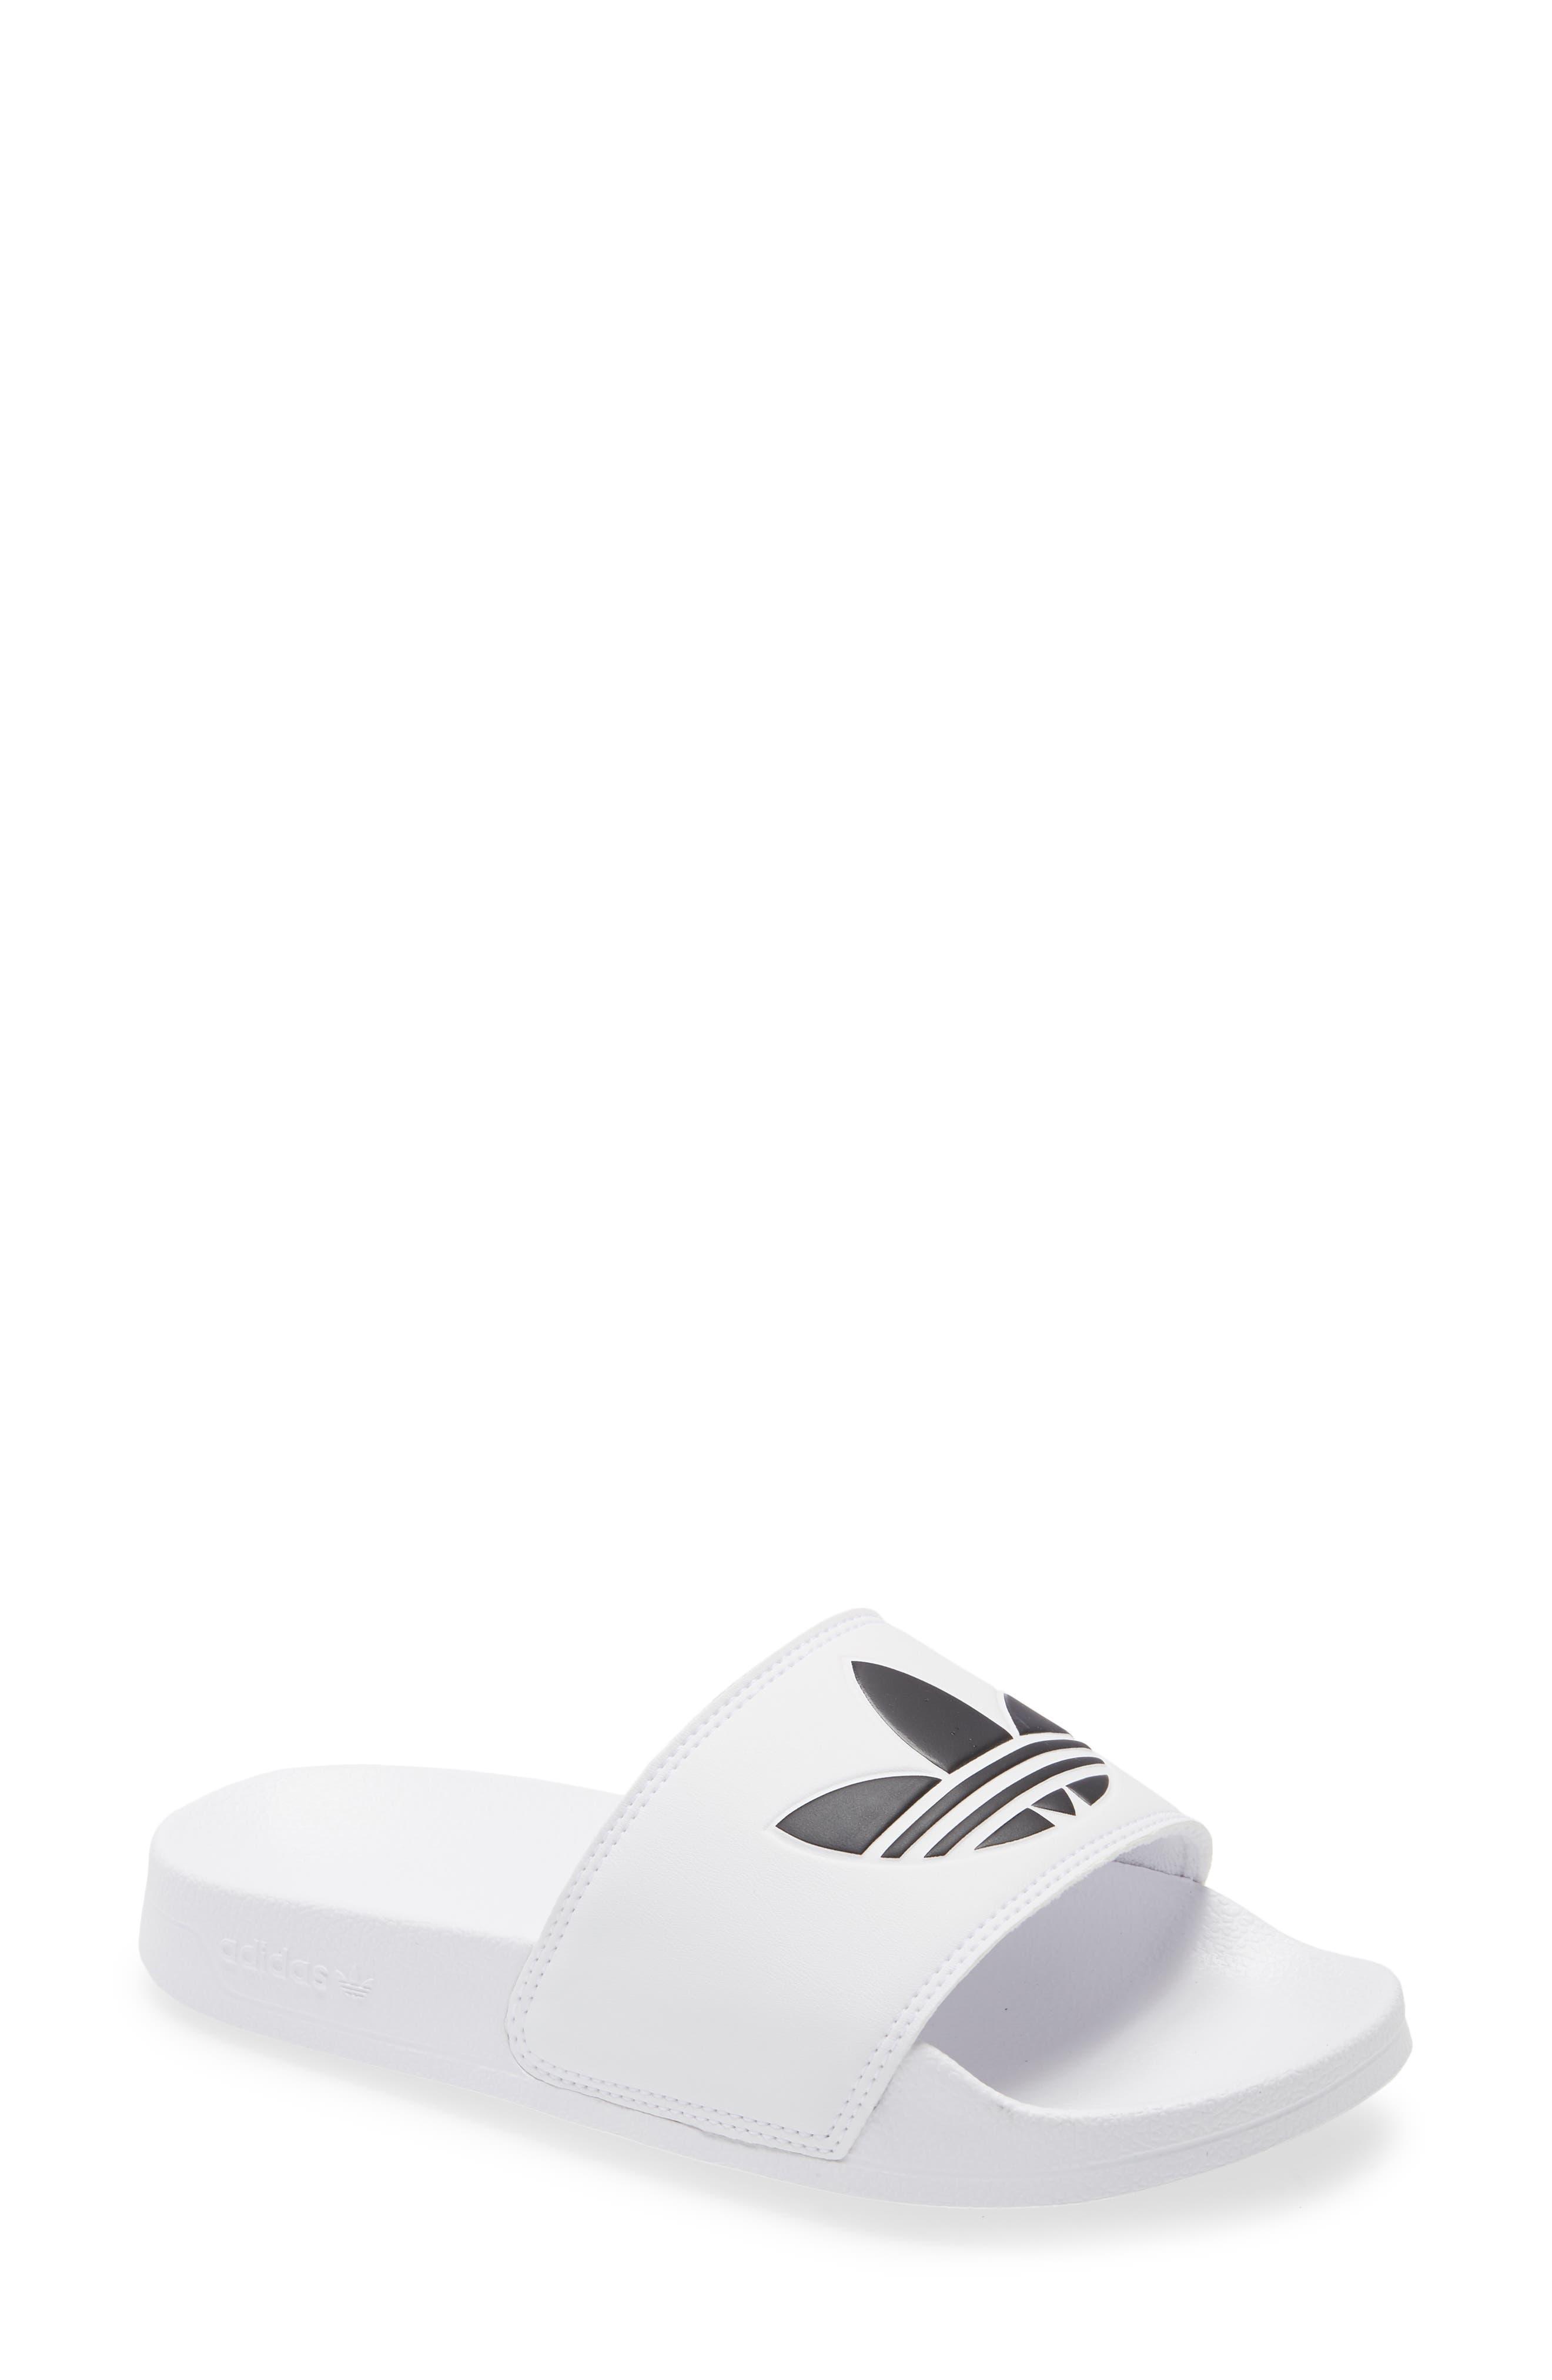 adidas Kid's Adidas Adilette Lite Sport Slide, Size 4 M - White